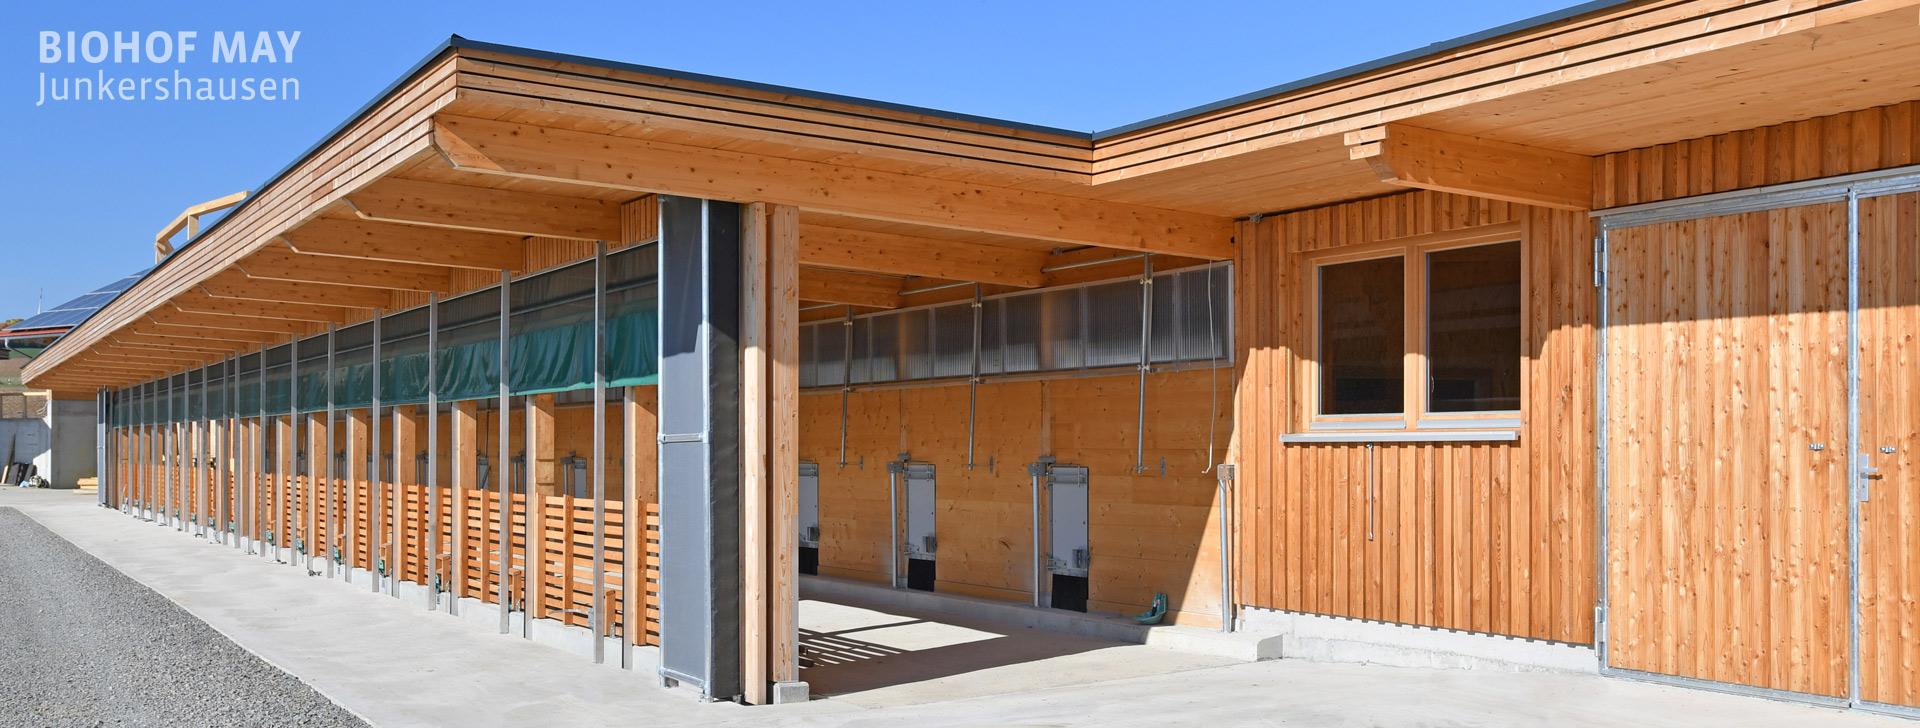 WOLF Referenzbau Biohof May